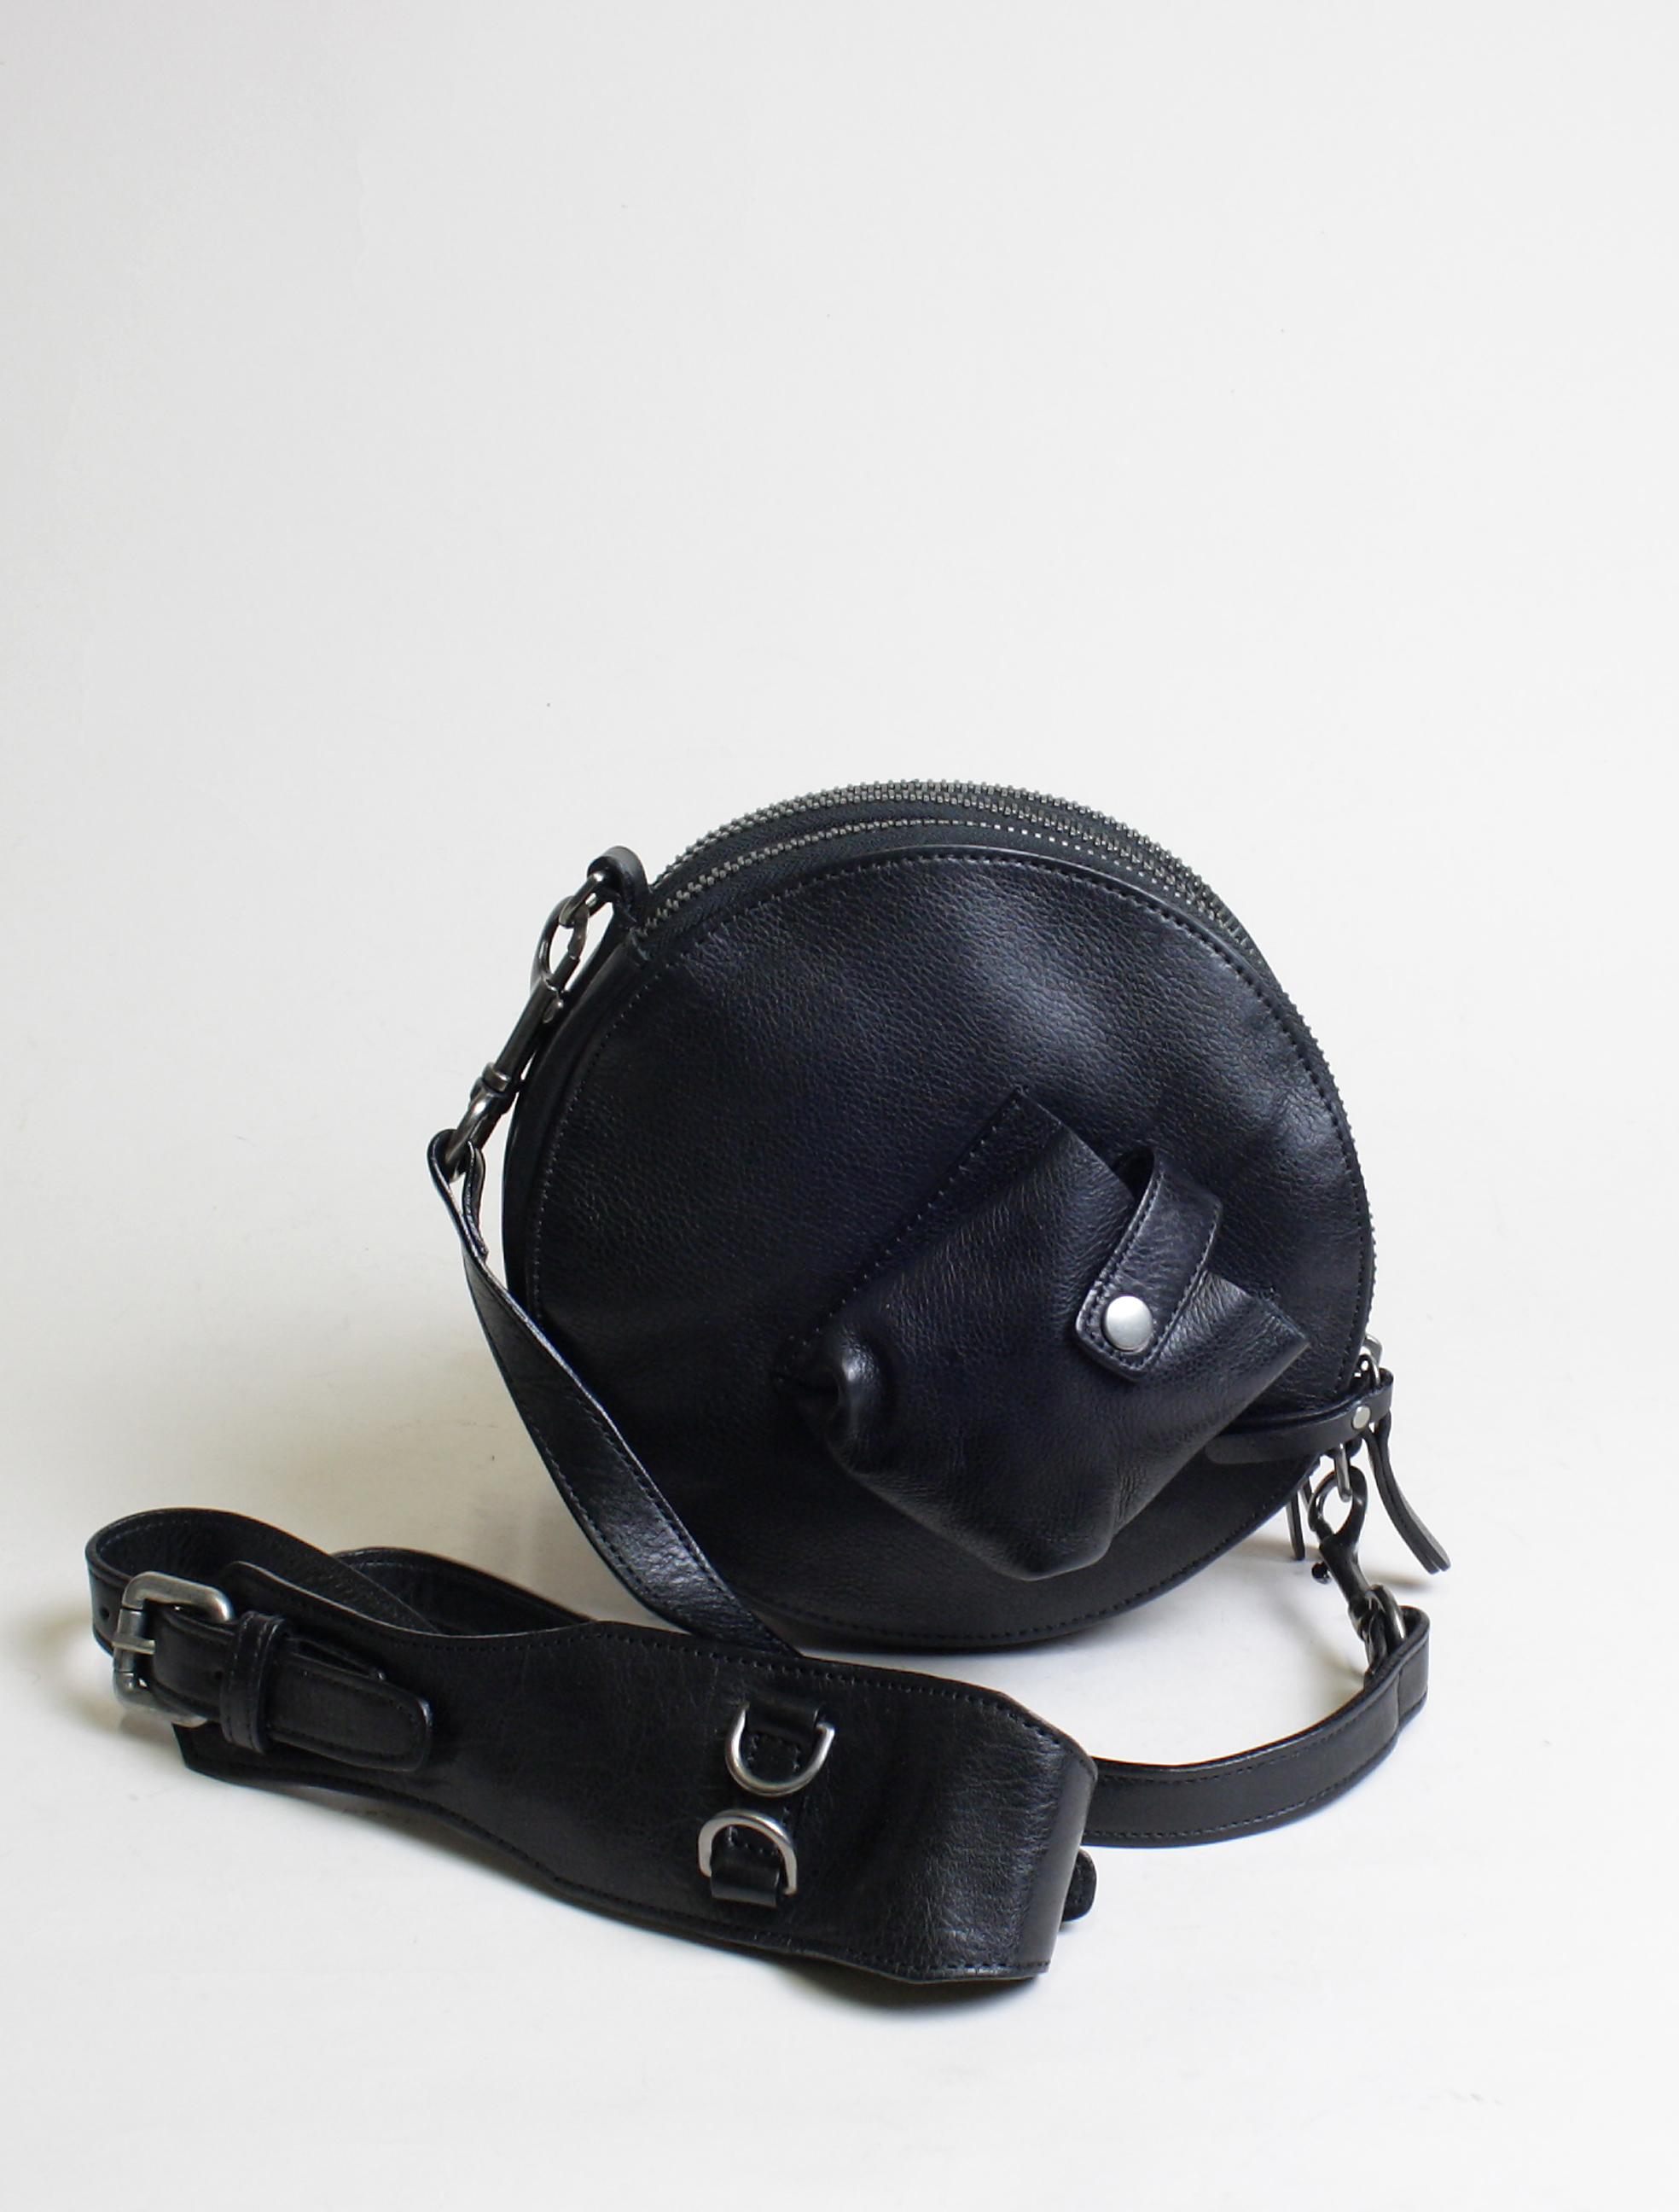 Re-Hard 5100 satchel round bag black